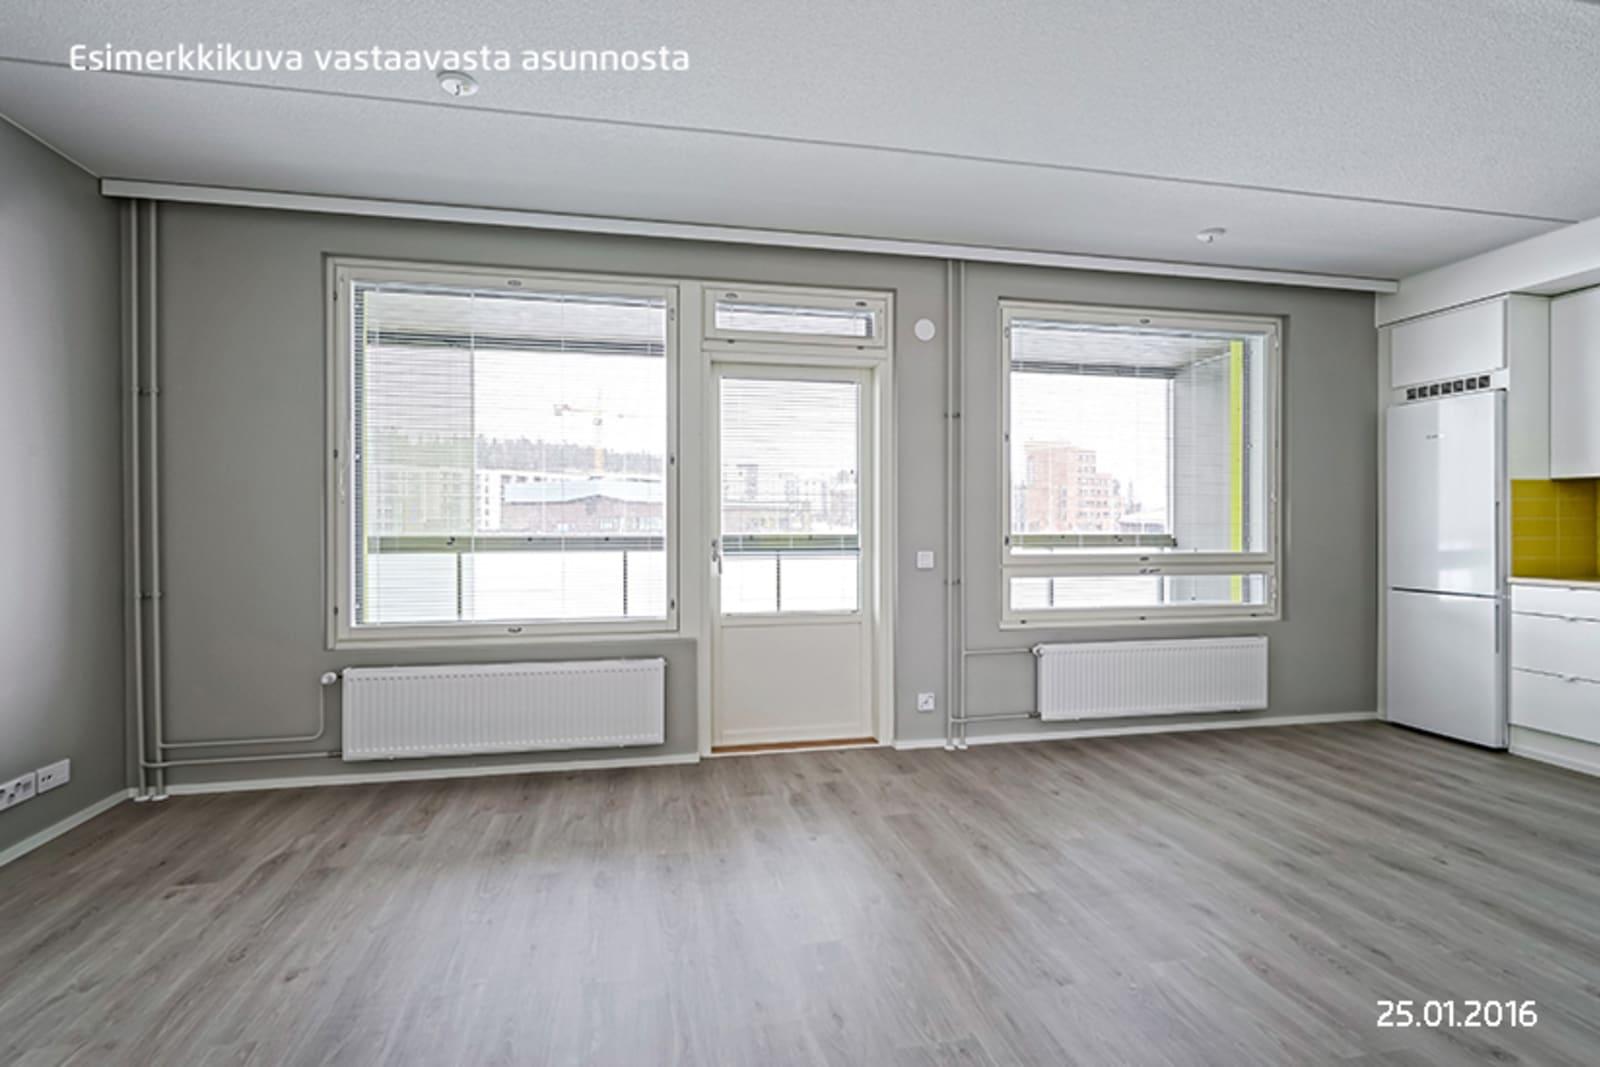 Espoo, Saunalahti, Magneettikatu 8 A 012